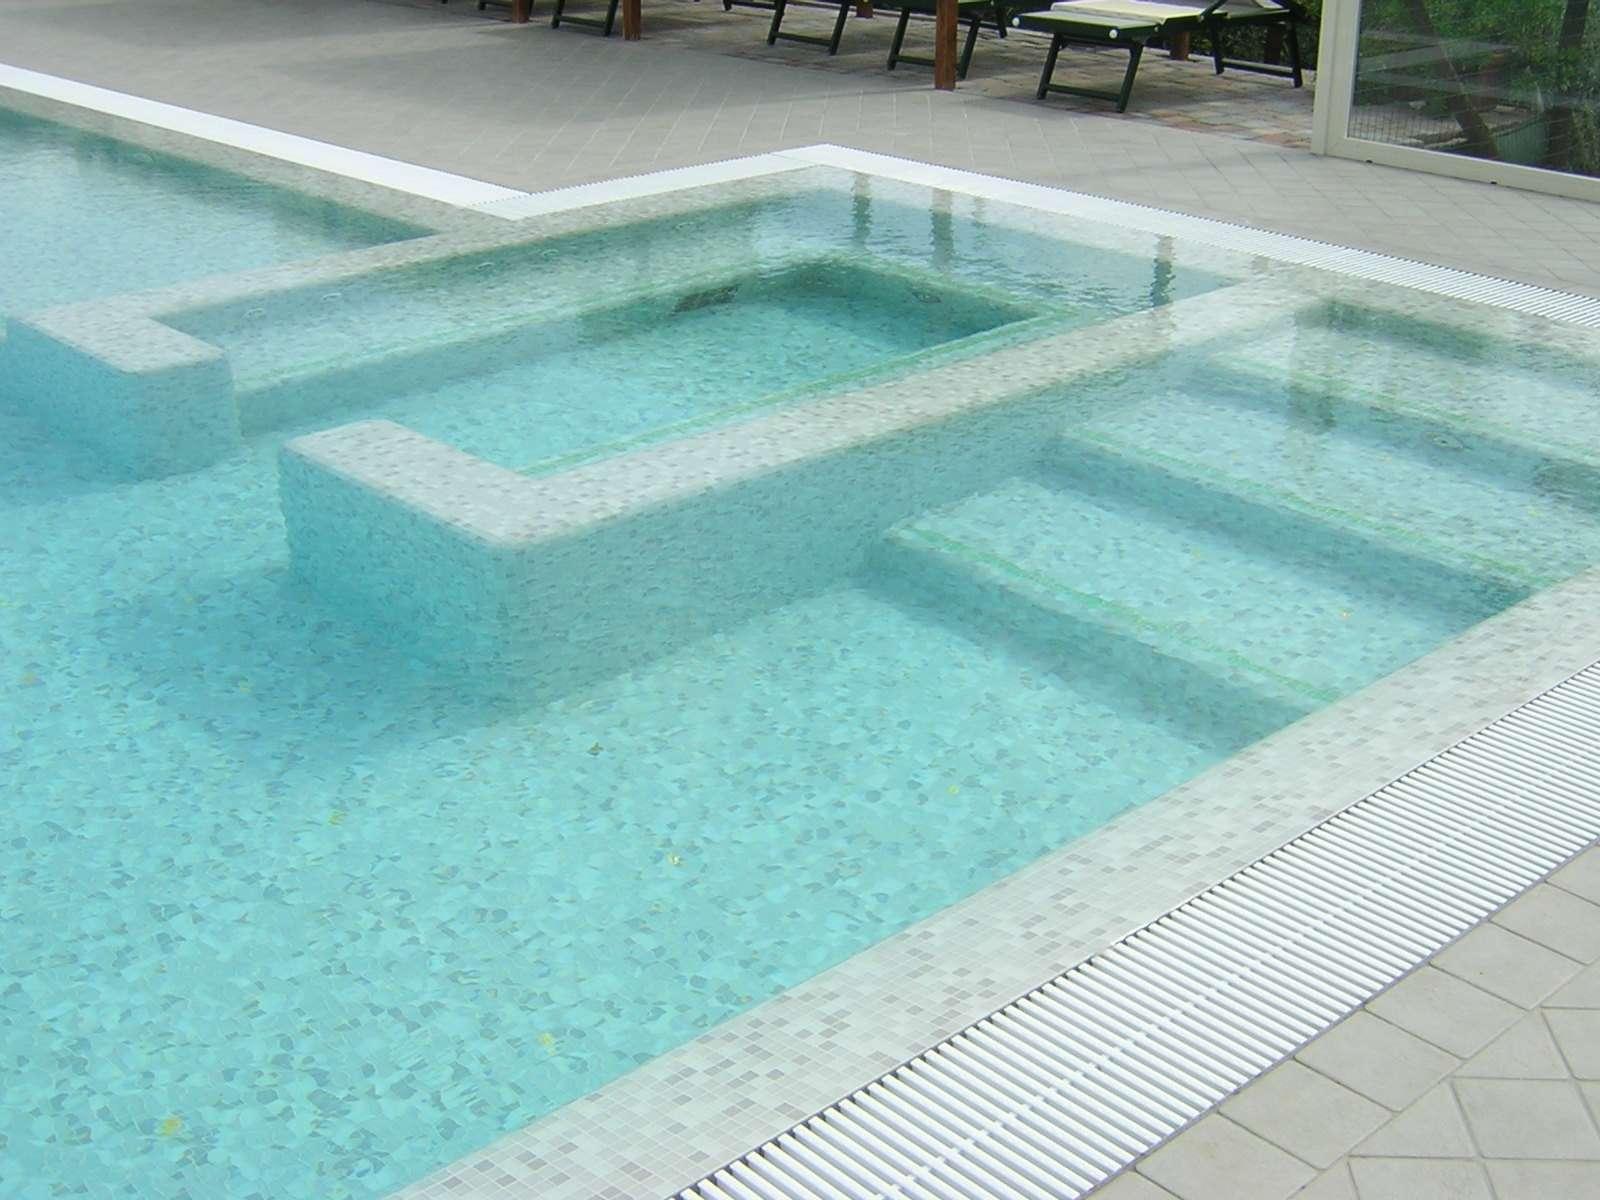 Piscine prefabbricate con fascia mosaico 1000 piscine for 1000 piscine